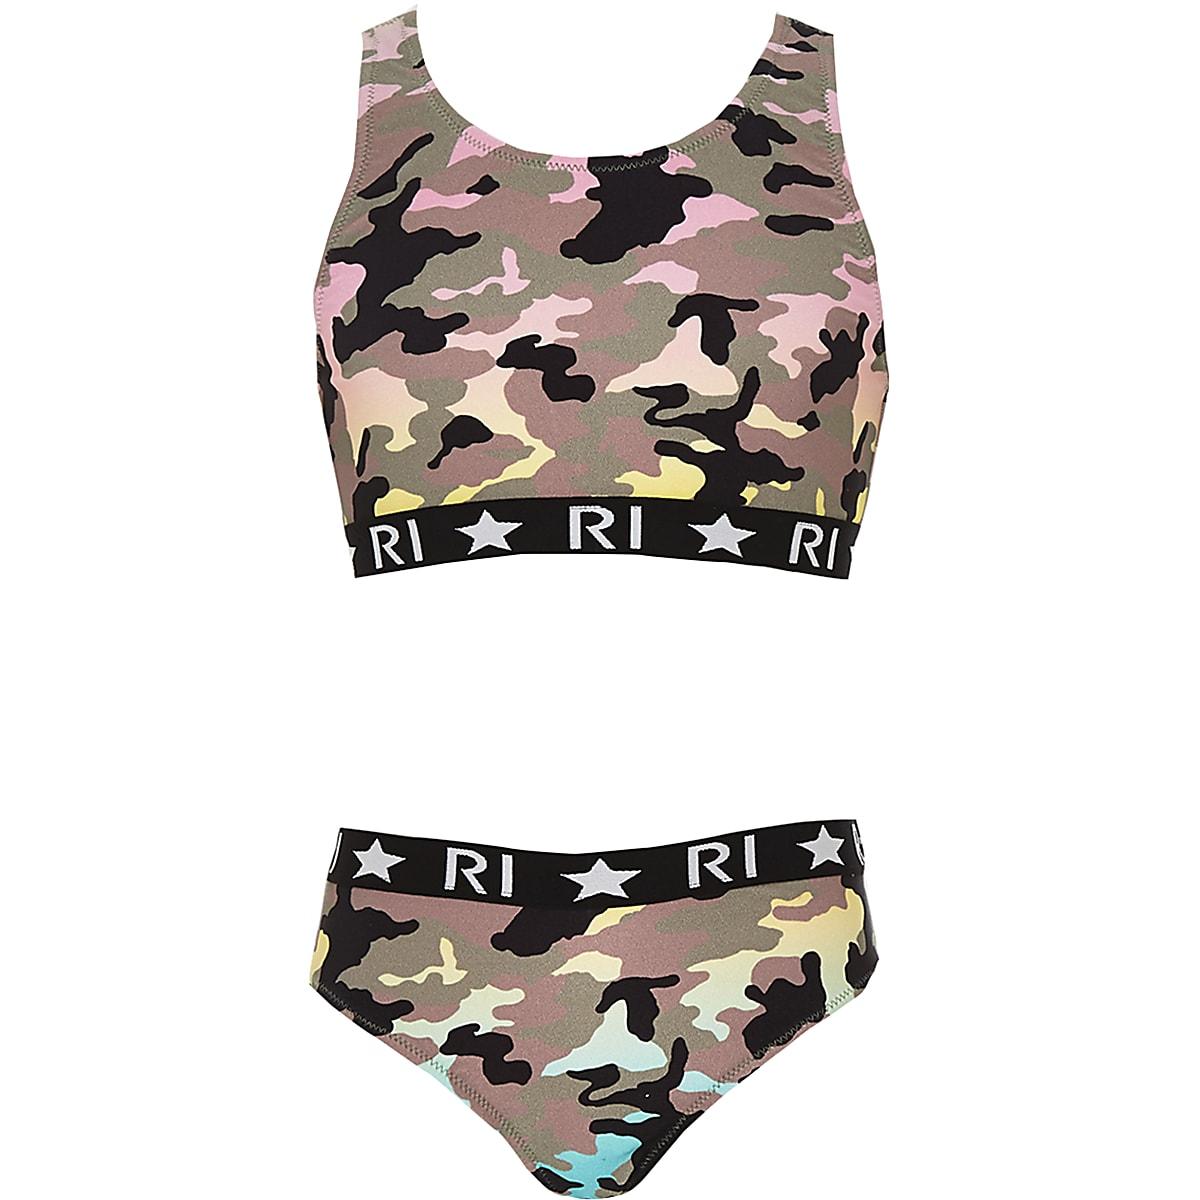 Girls khaki camo print RI bikini set